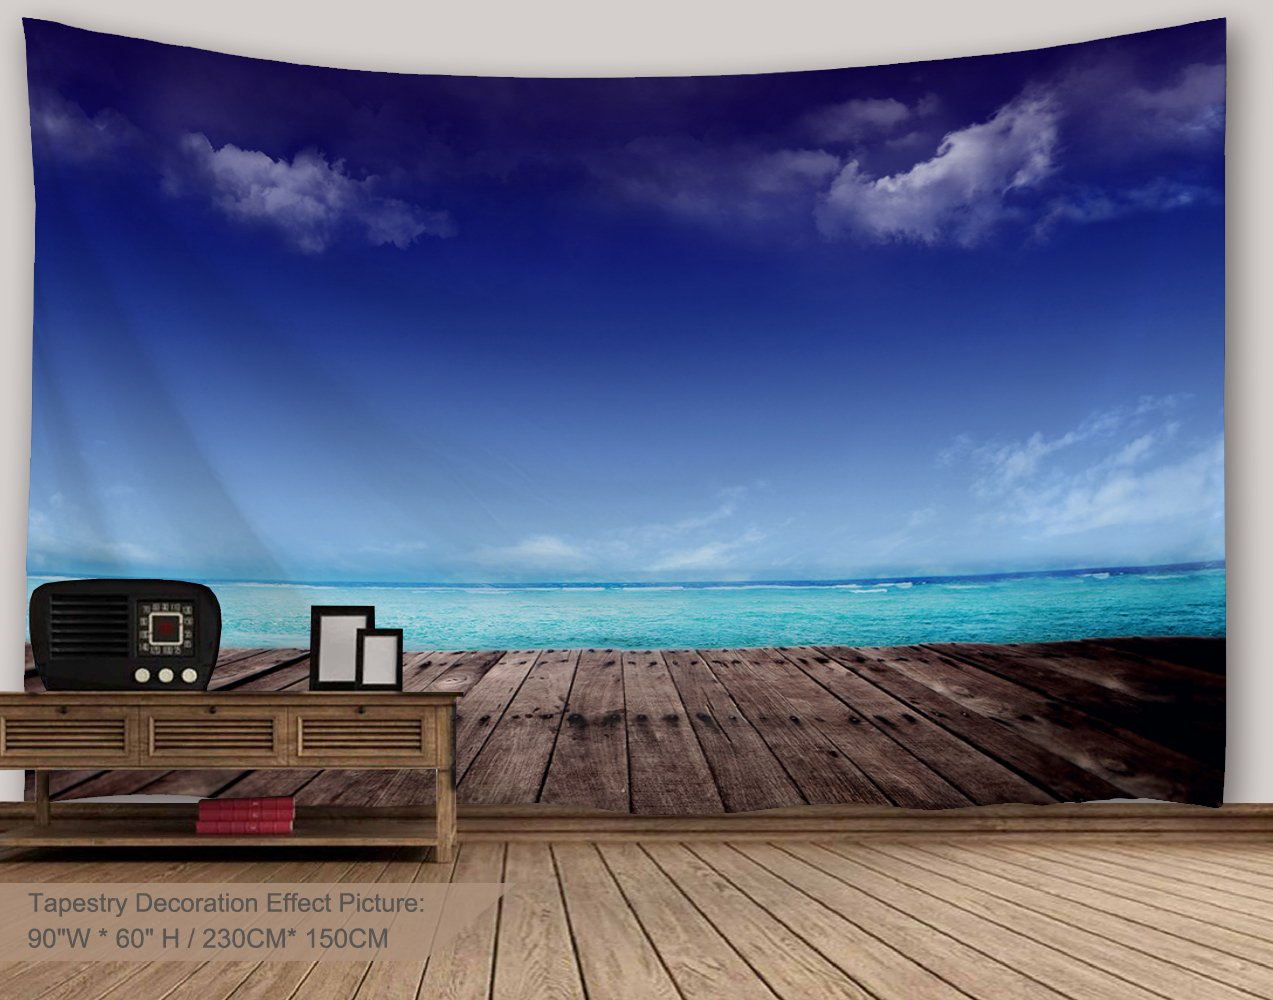 Alfalfa Wall Hanging Decor Nature Art Polyester Fabric Tapestry, Ocean Beach Theme, For Dorm Room, Bedroom,Living Room - 90'' W x 60'' L (230cmx150cm) - Wooden Bridge On Ocean Beach